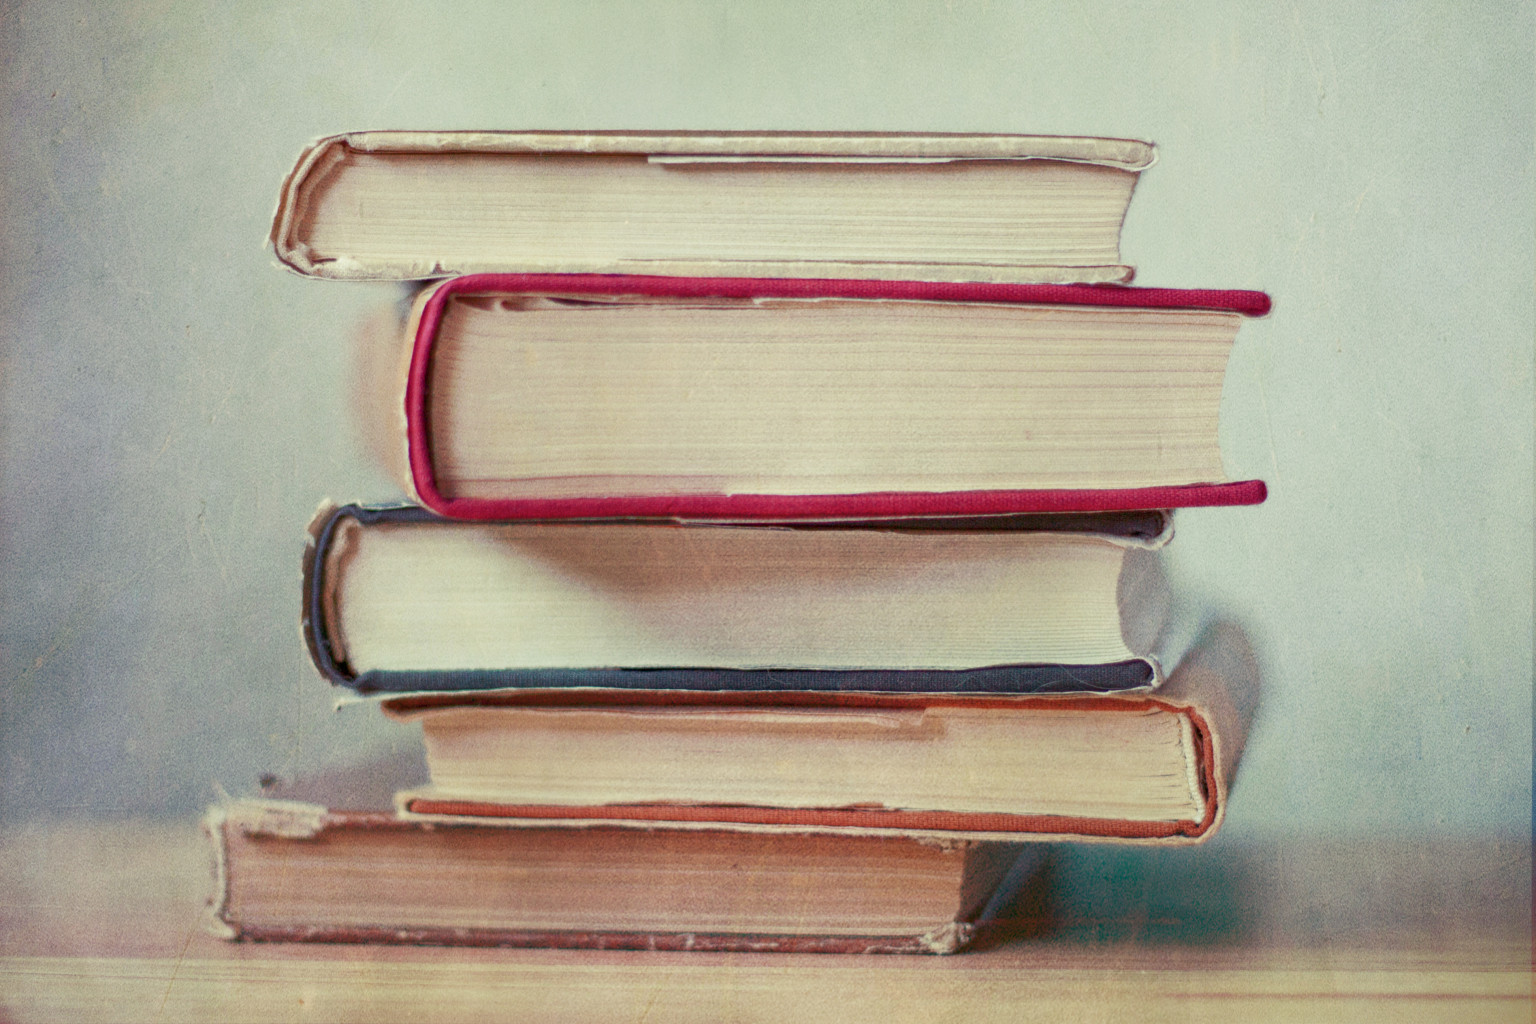 books novels literary stack read reading literature five photograph gen